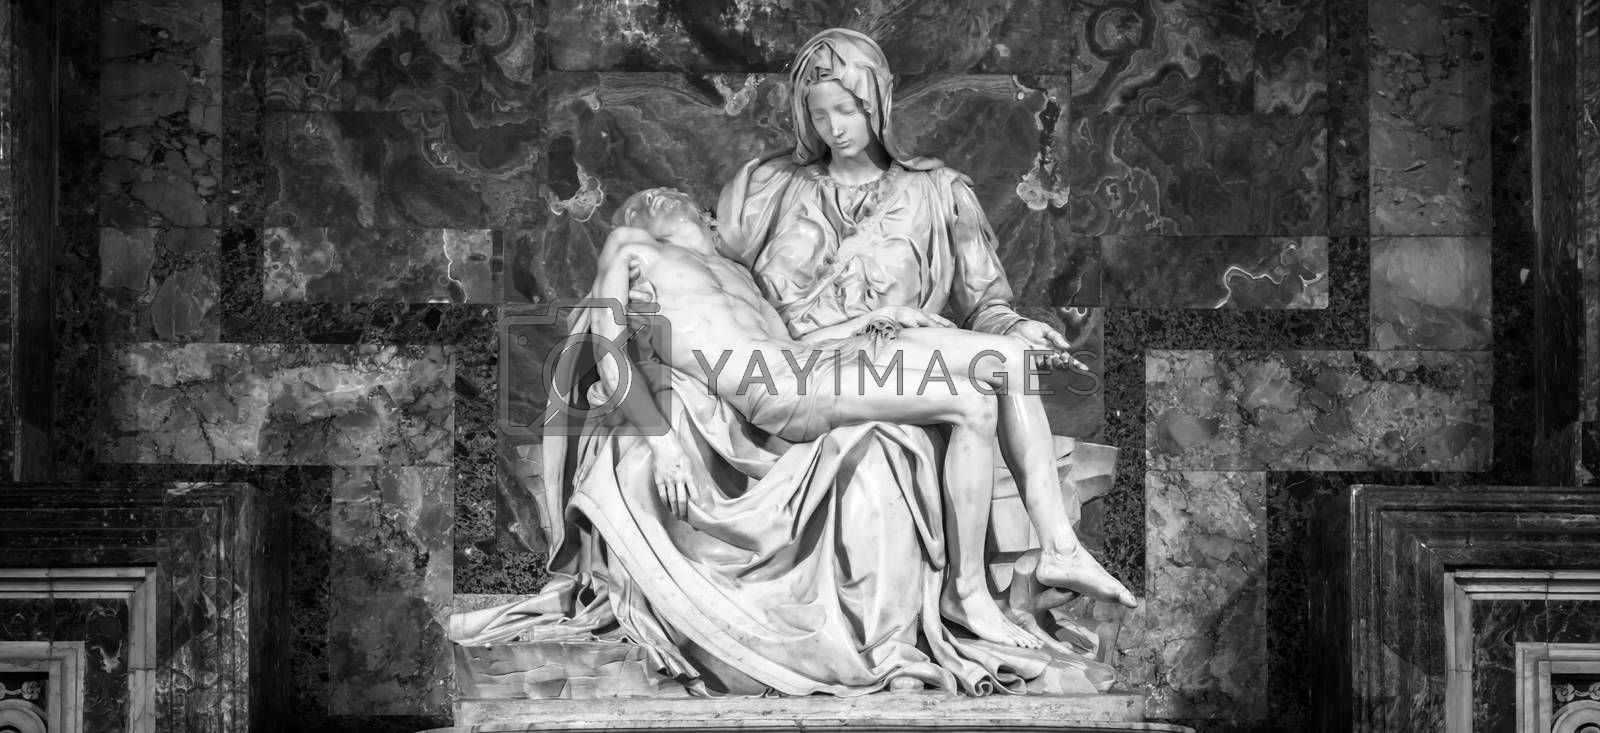 ROME, VATICAN STATE - August 28, 2018: Pietà di Michelangelo (The Pity), 1498-1499, located in St. Peter Basilica in Rome